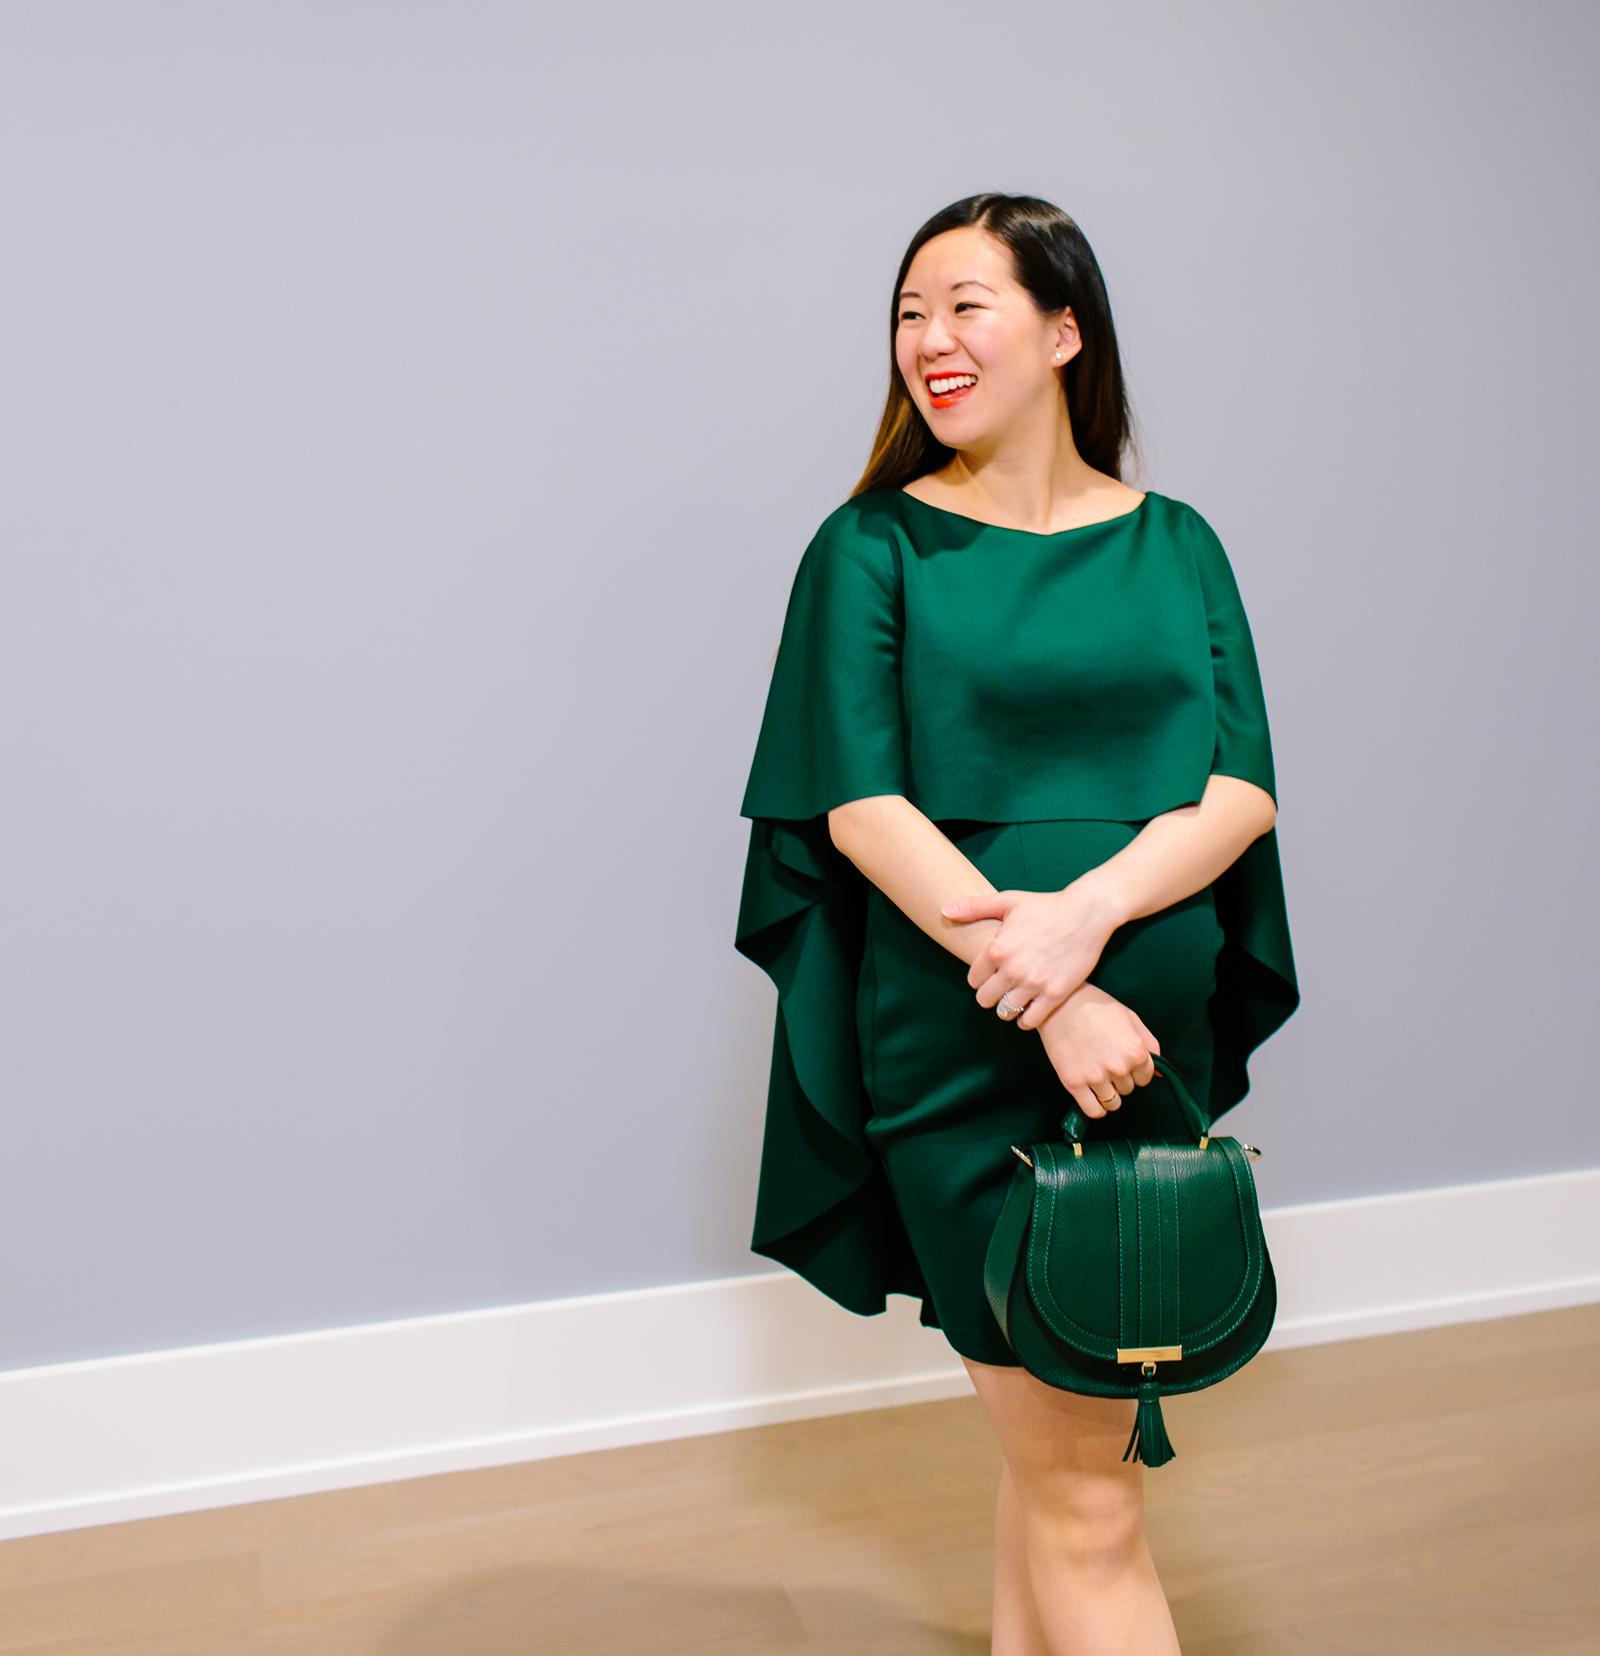 Affordable Maternity Evening Wear, Tia Perciballi Fashion & Lifestyle Blog